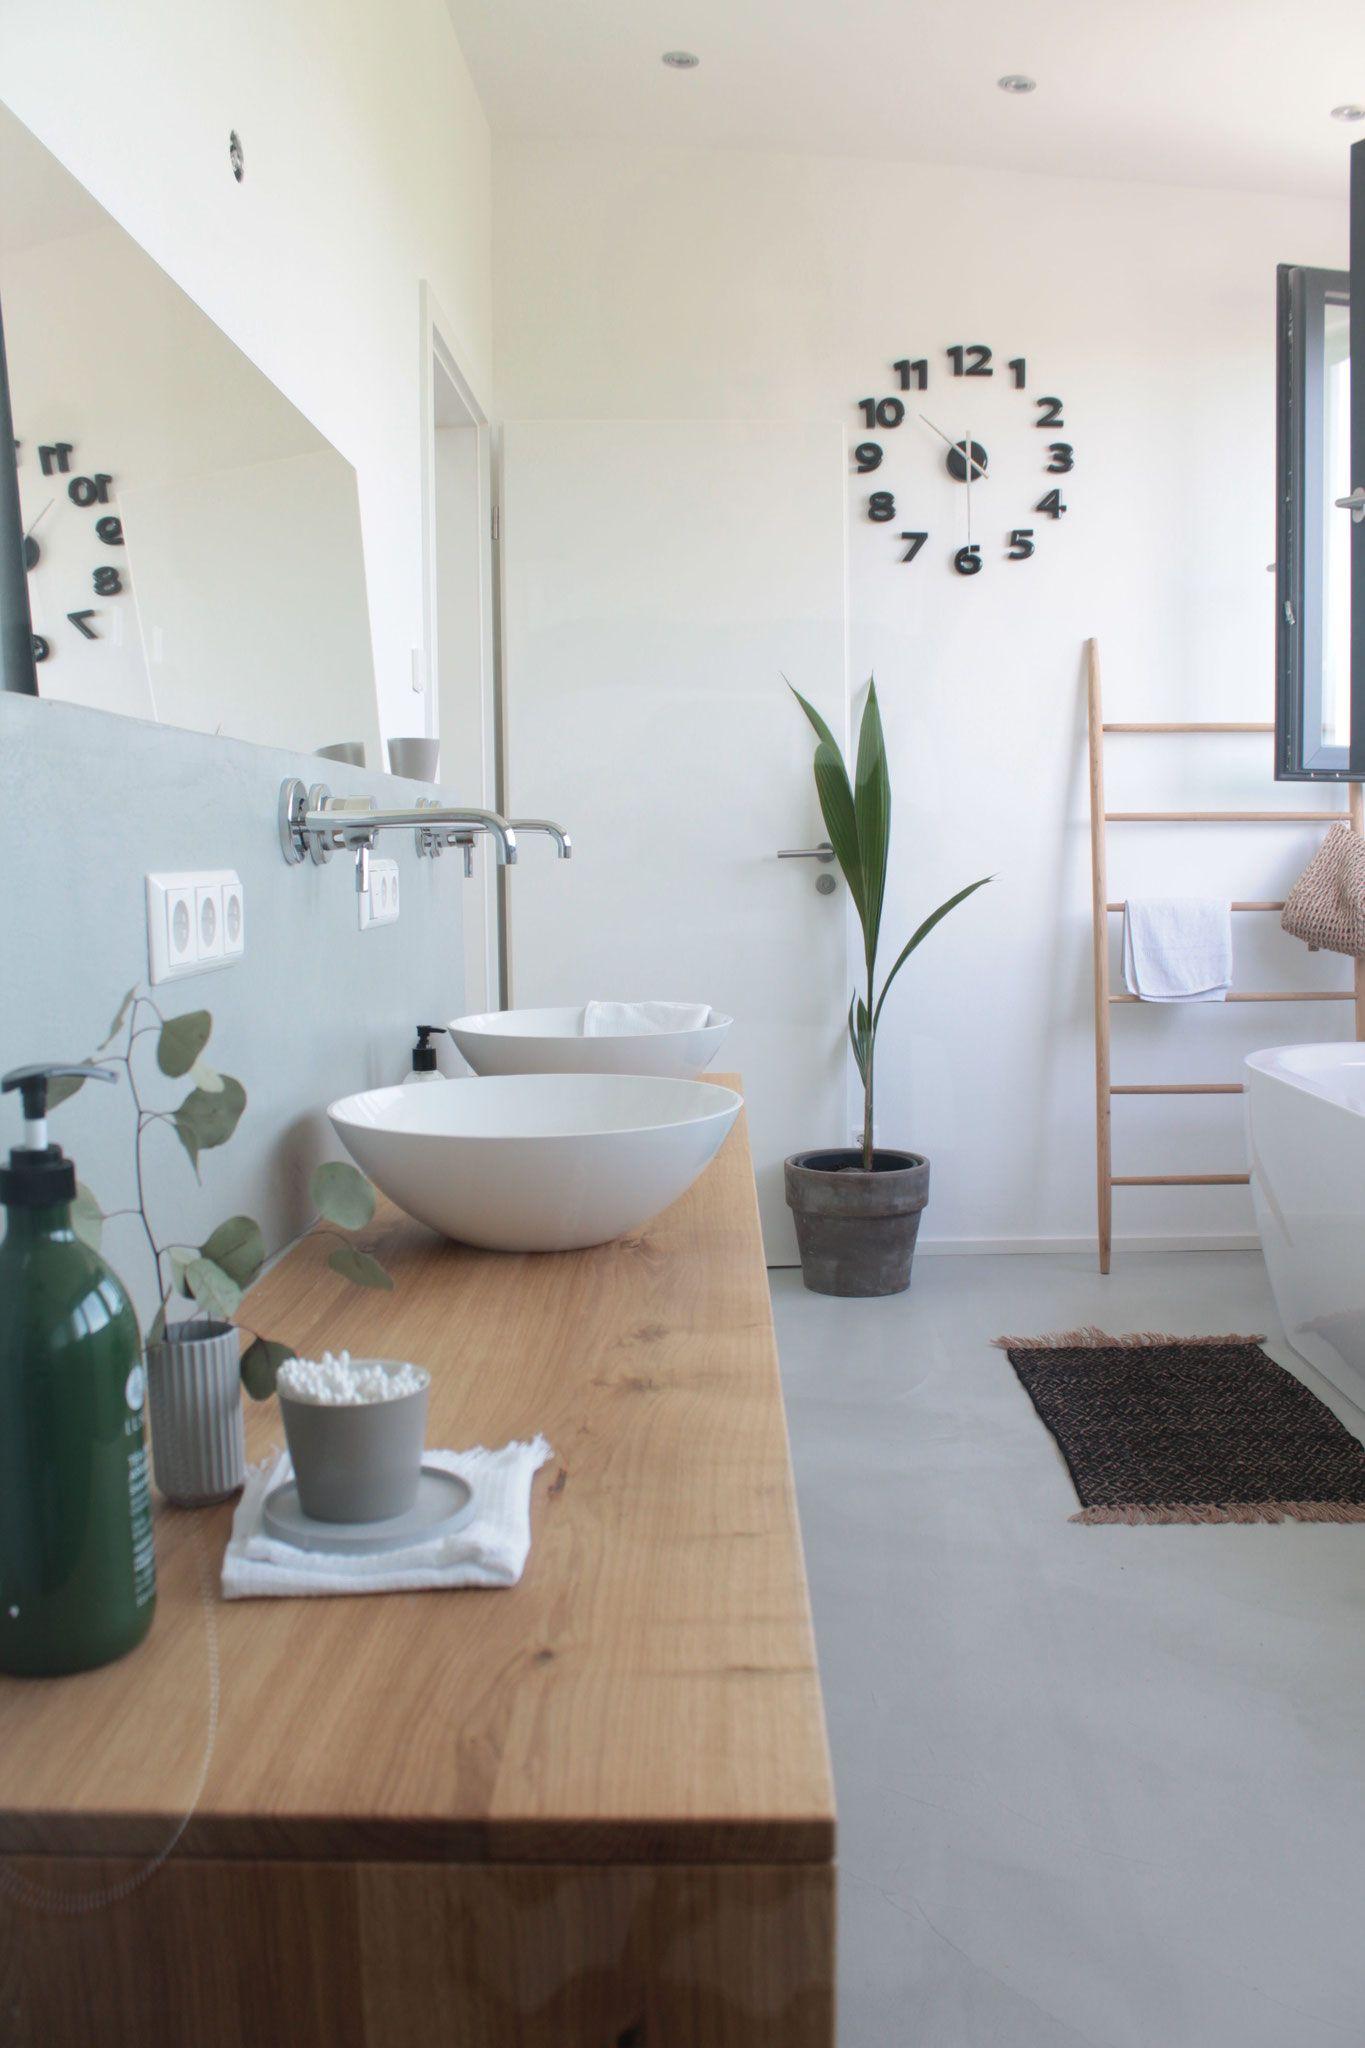 Fugenloses Badezimmer Koenigskram Webseite In 2020 Badezimmer Badezimmer Verputzen Badezimmer Trends